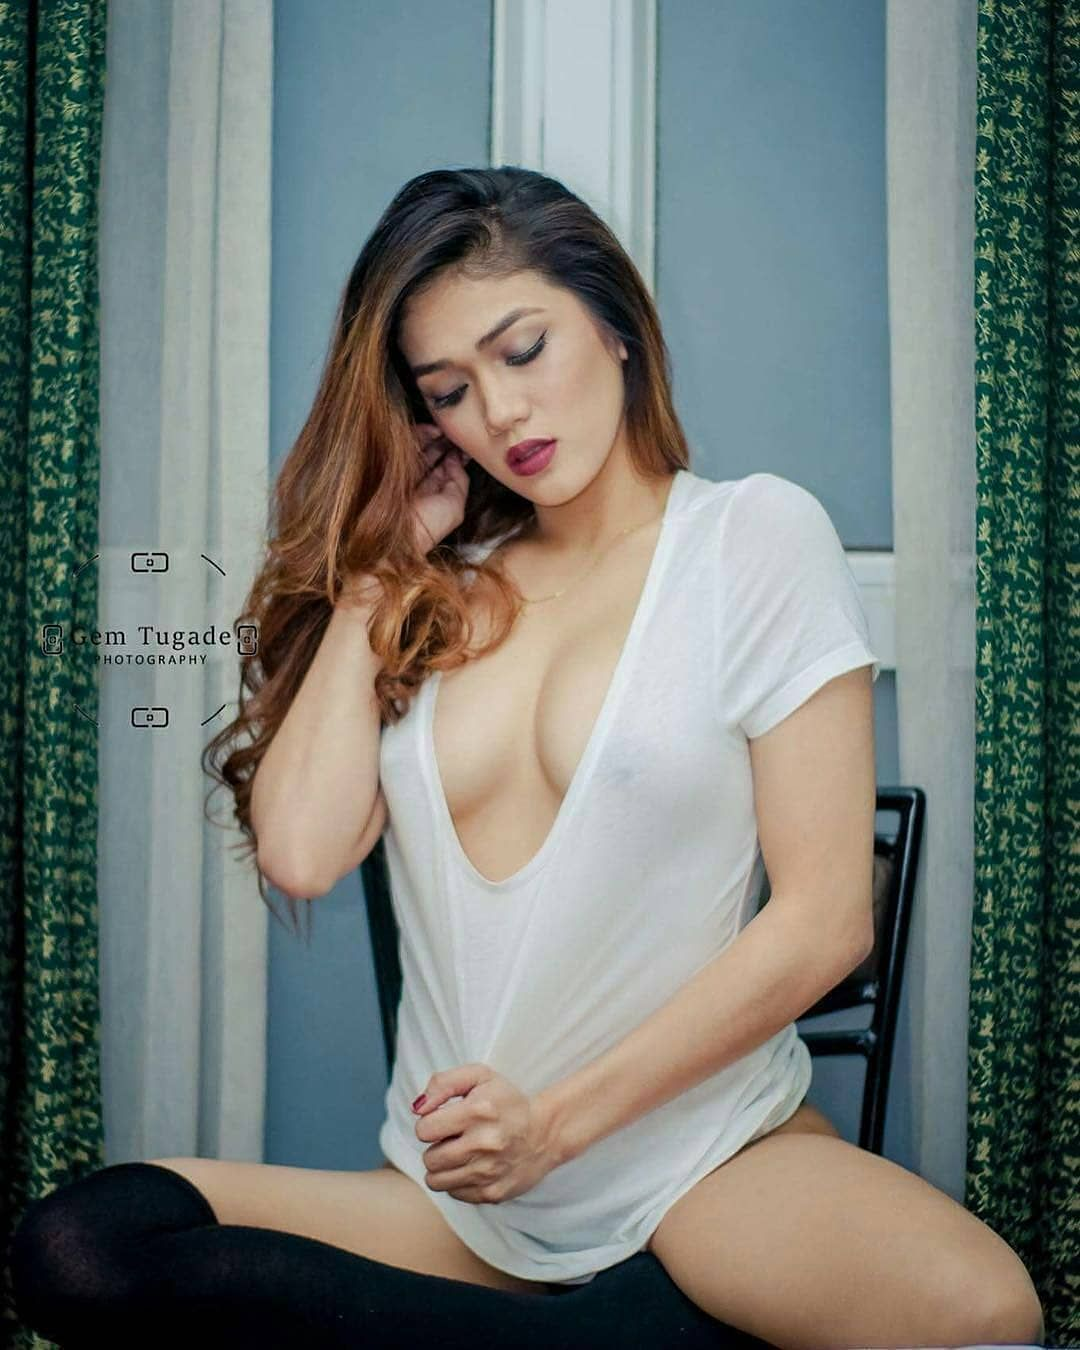 Regrann From Besoknakal Nakal Video Seksi Hot Viral Bugil Youtube Youtuber Idola Bola Yooying